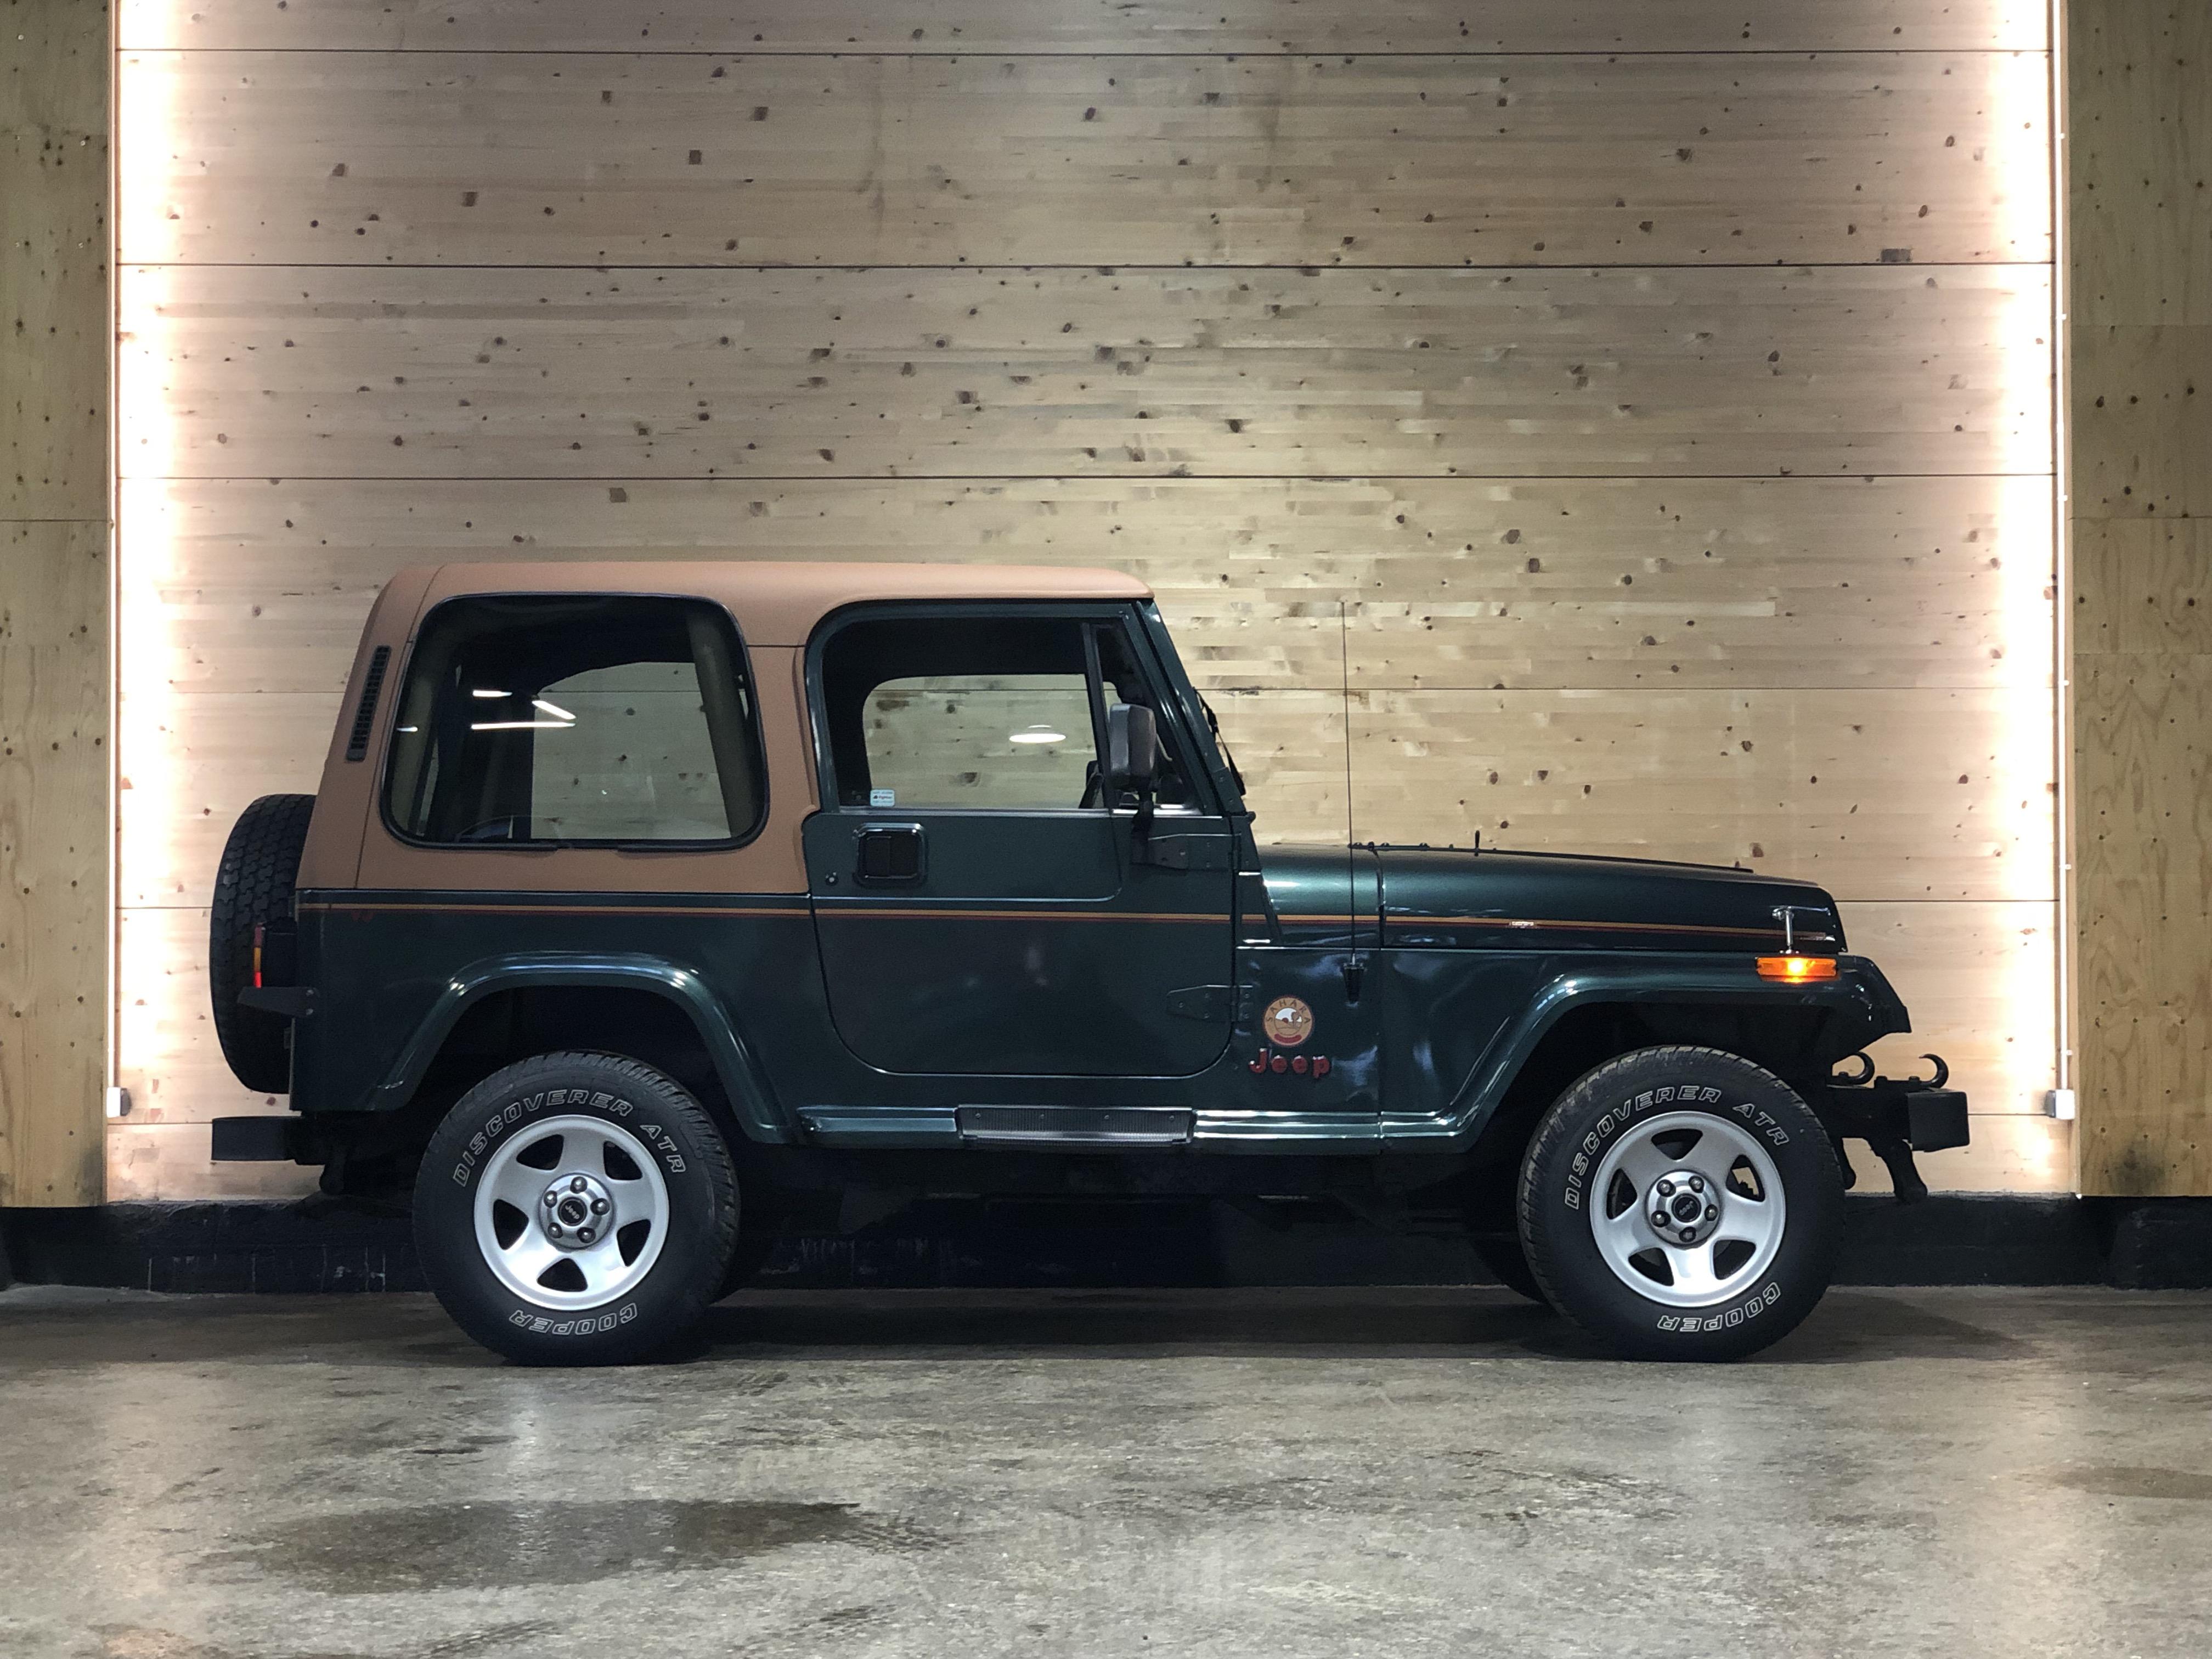 Jeep Wrangler YJ 4.0 Sahara